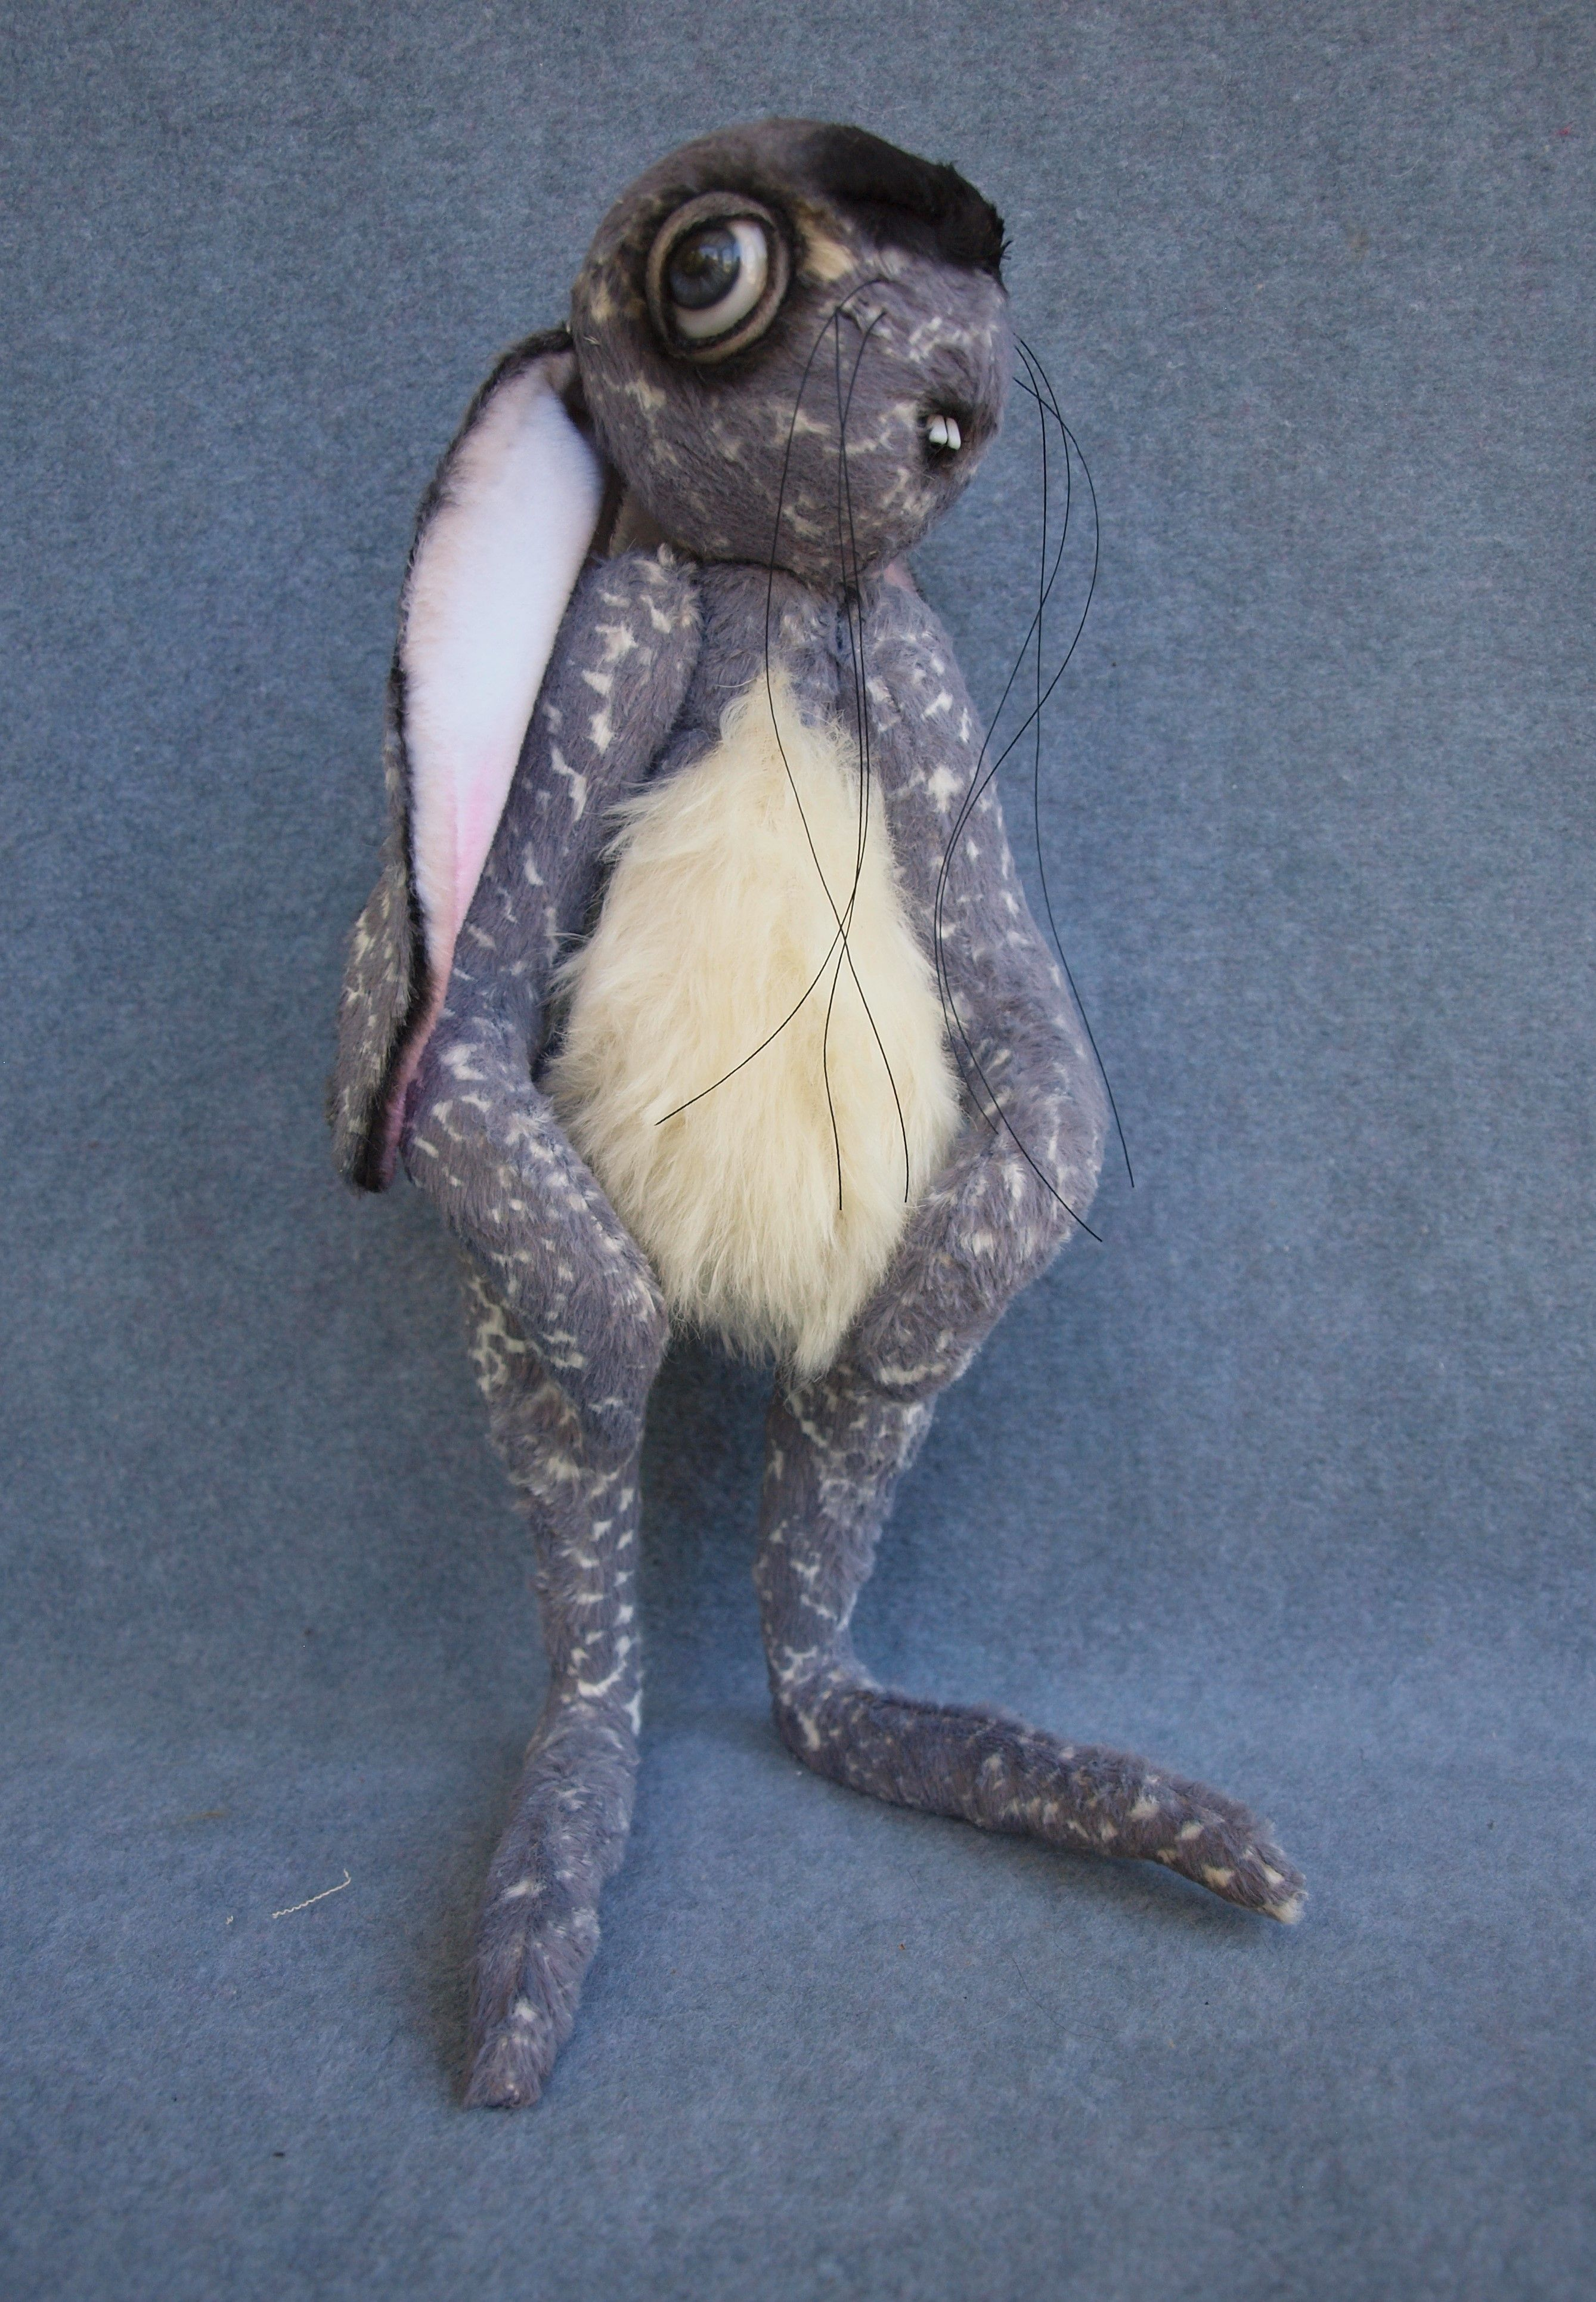 Dandy chatham village bears rabbits and artist dolls